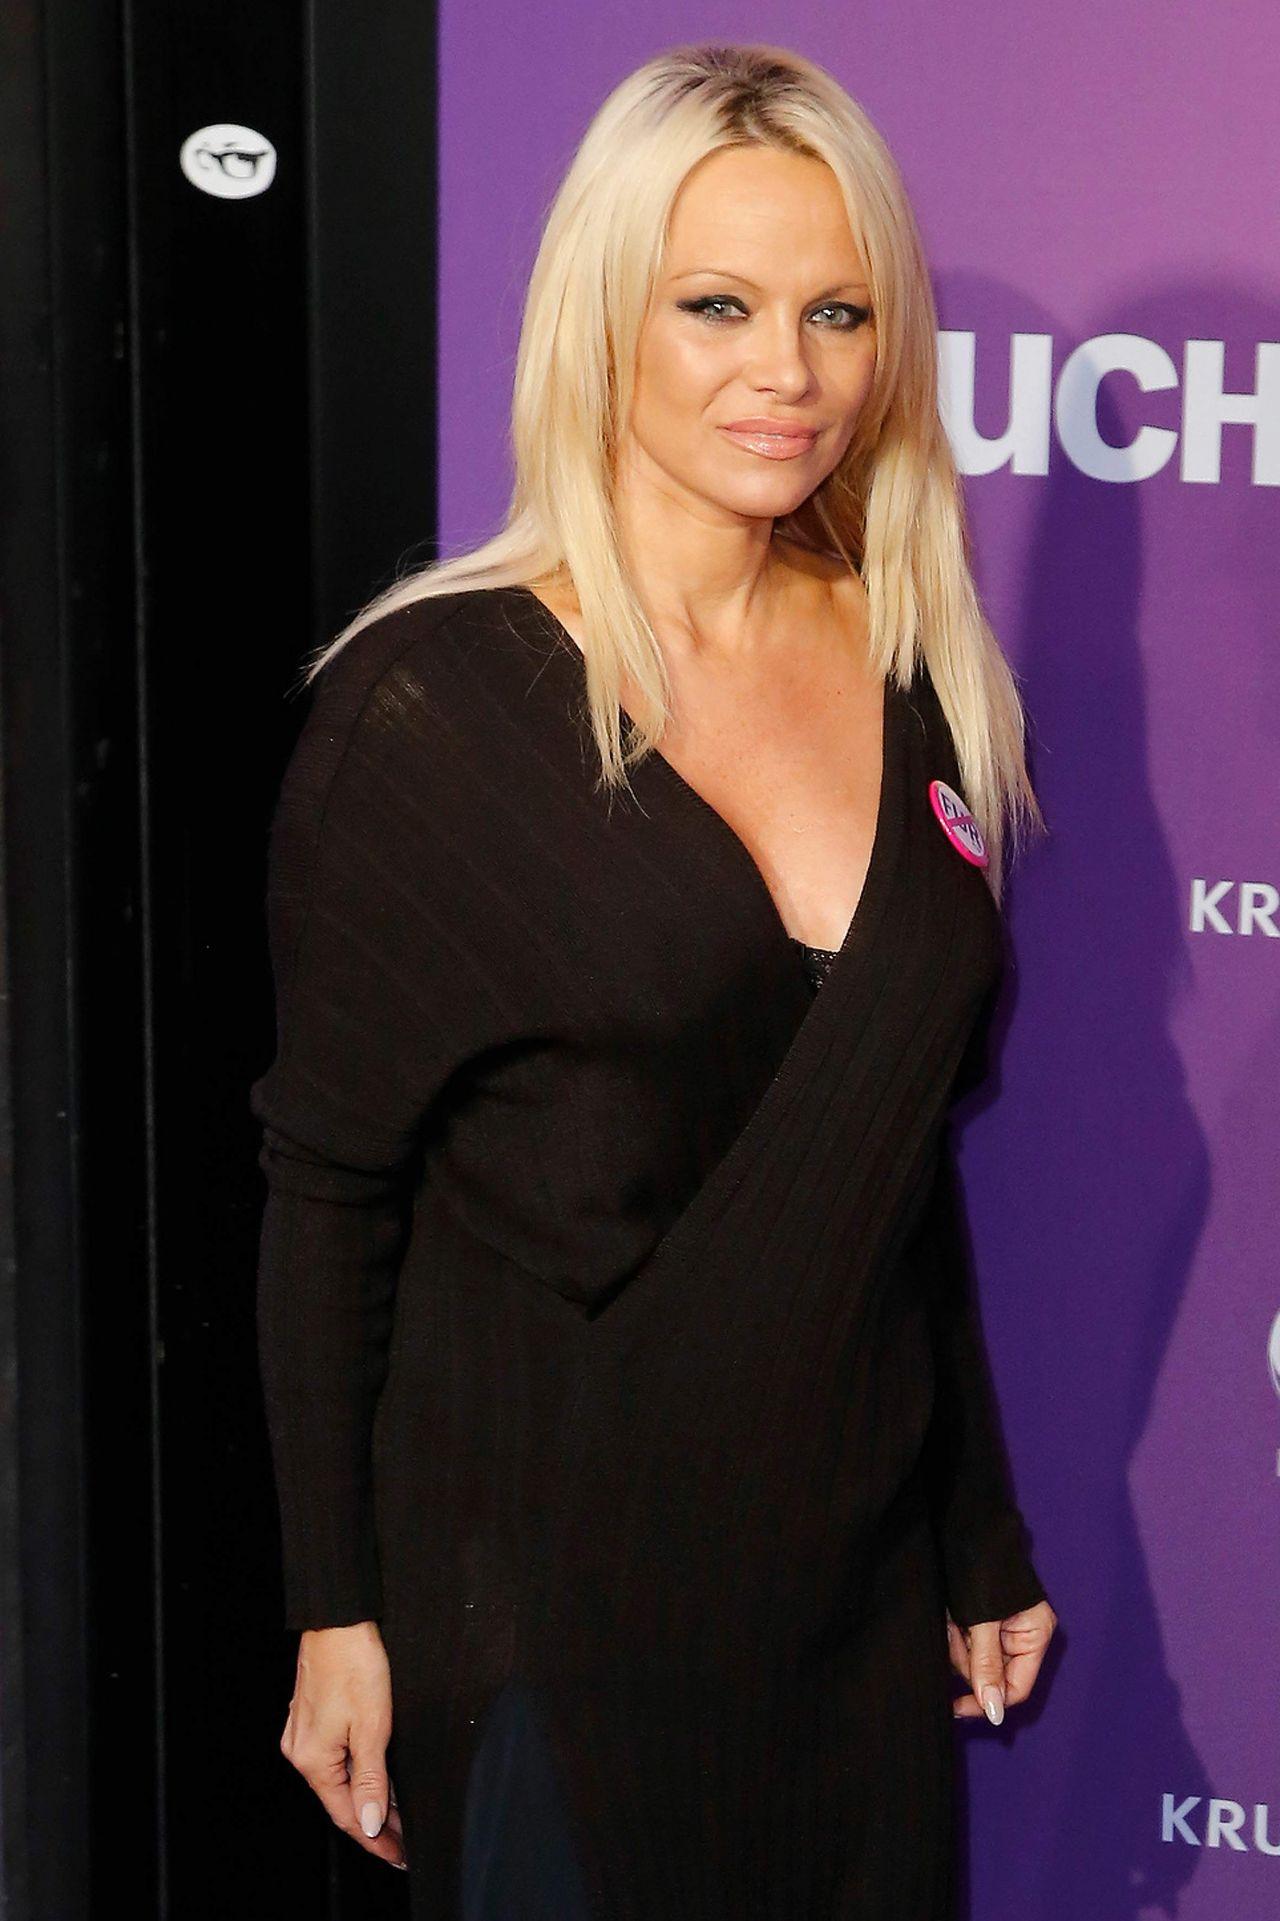 Pamela Anderson - Icons & Idols No 3 Event, September 2015 Pamela Anderson